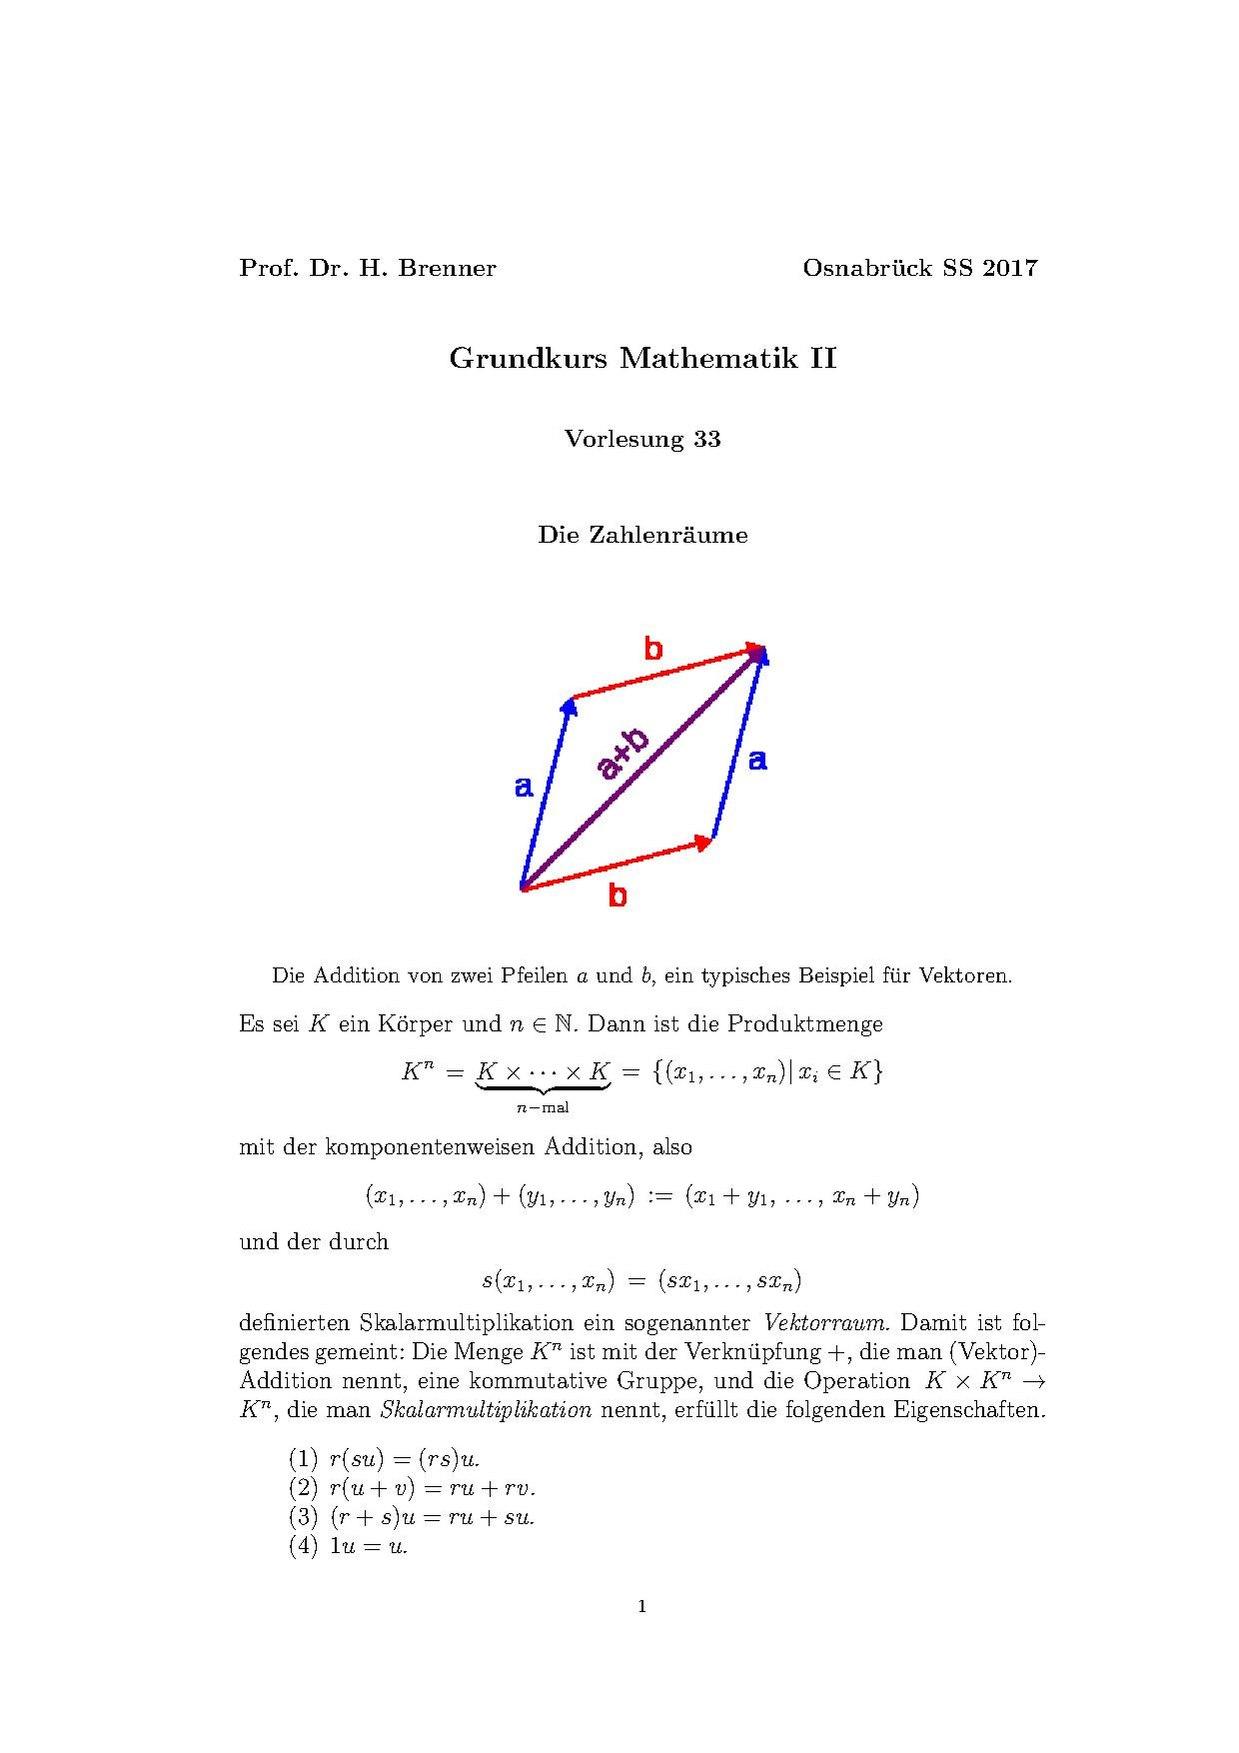 File:Grundkurs Mathematik (Osnabrück 2016-2017)Teil IIVorlesung33 ...